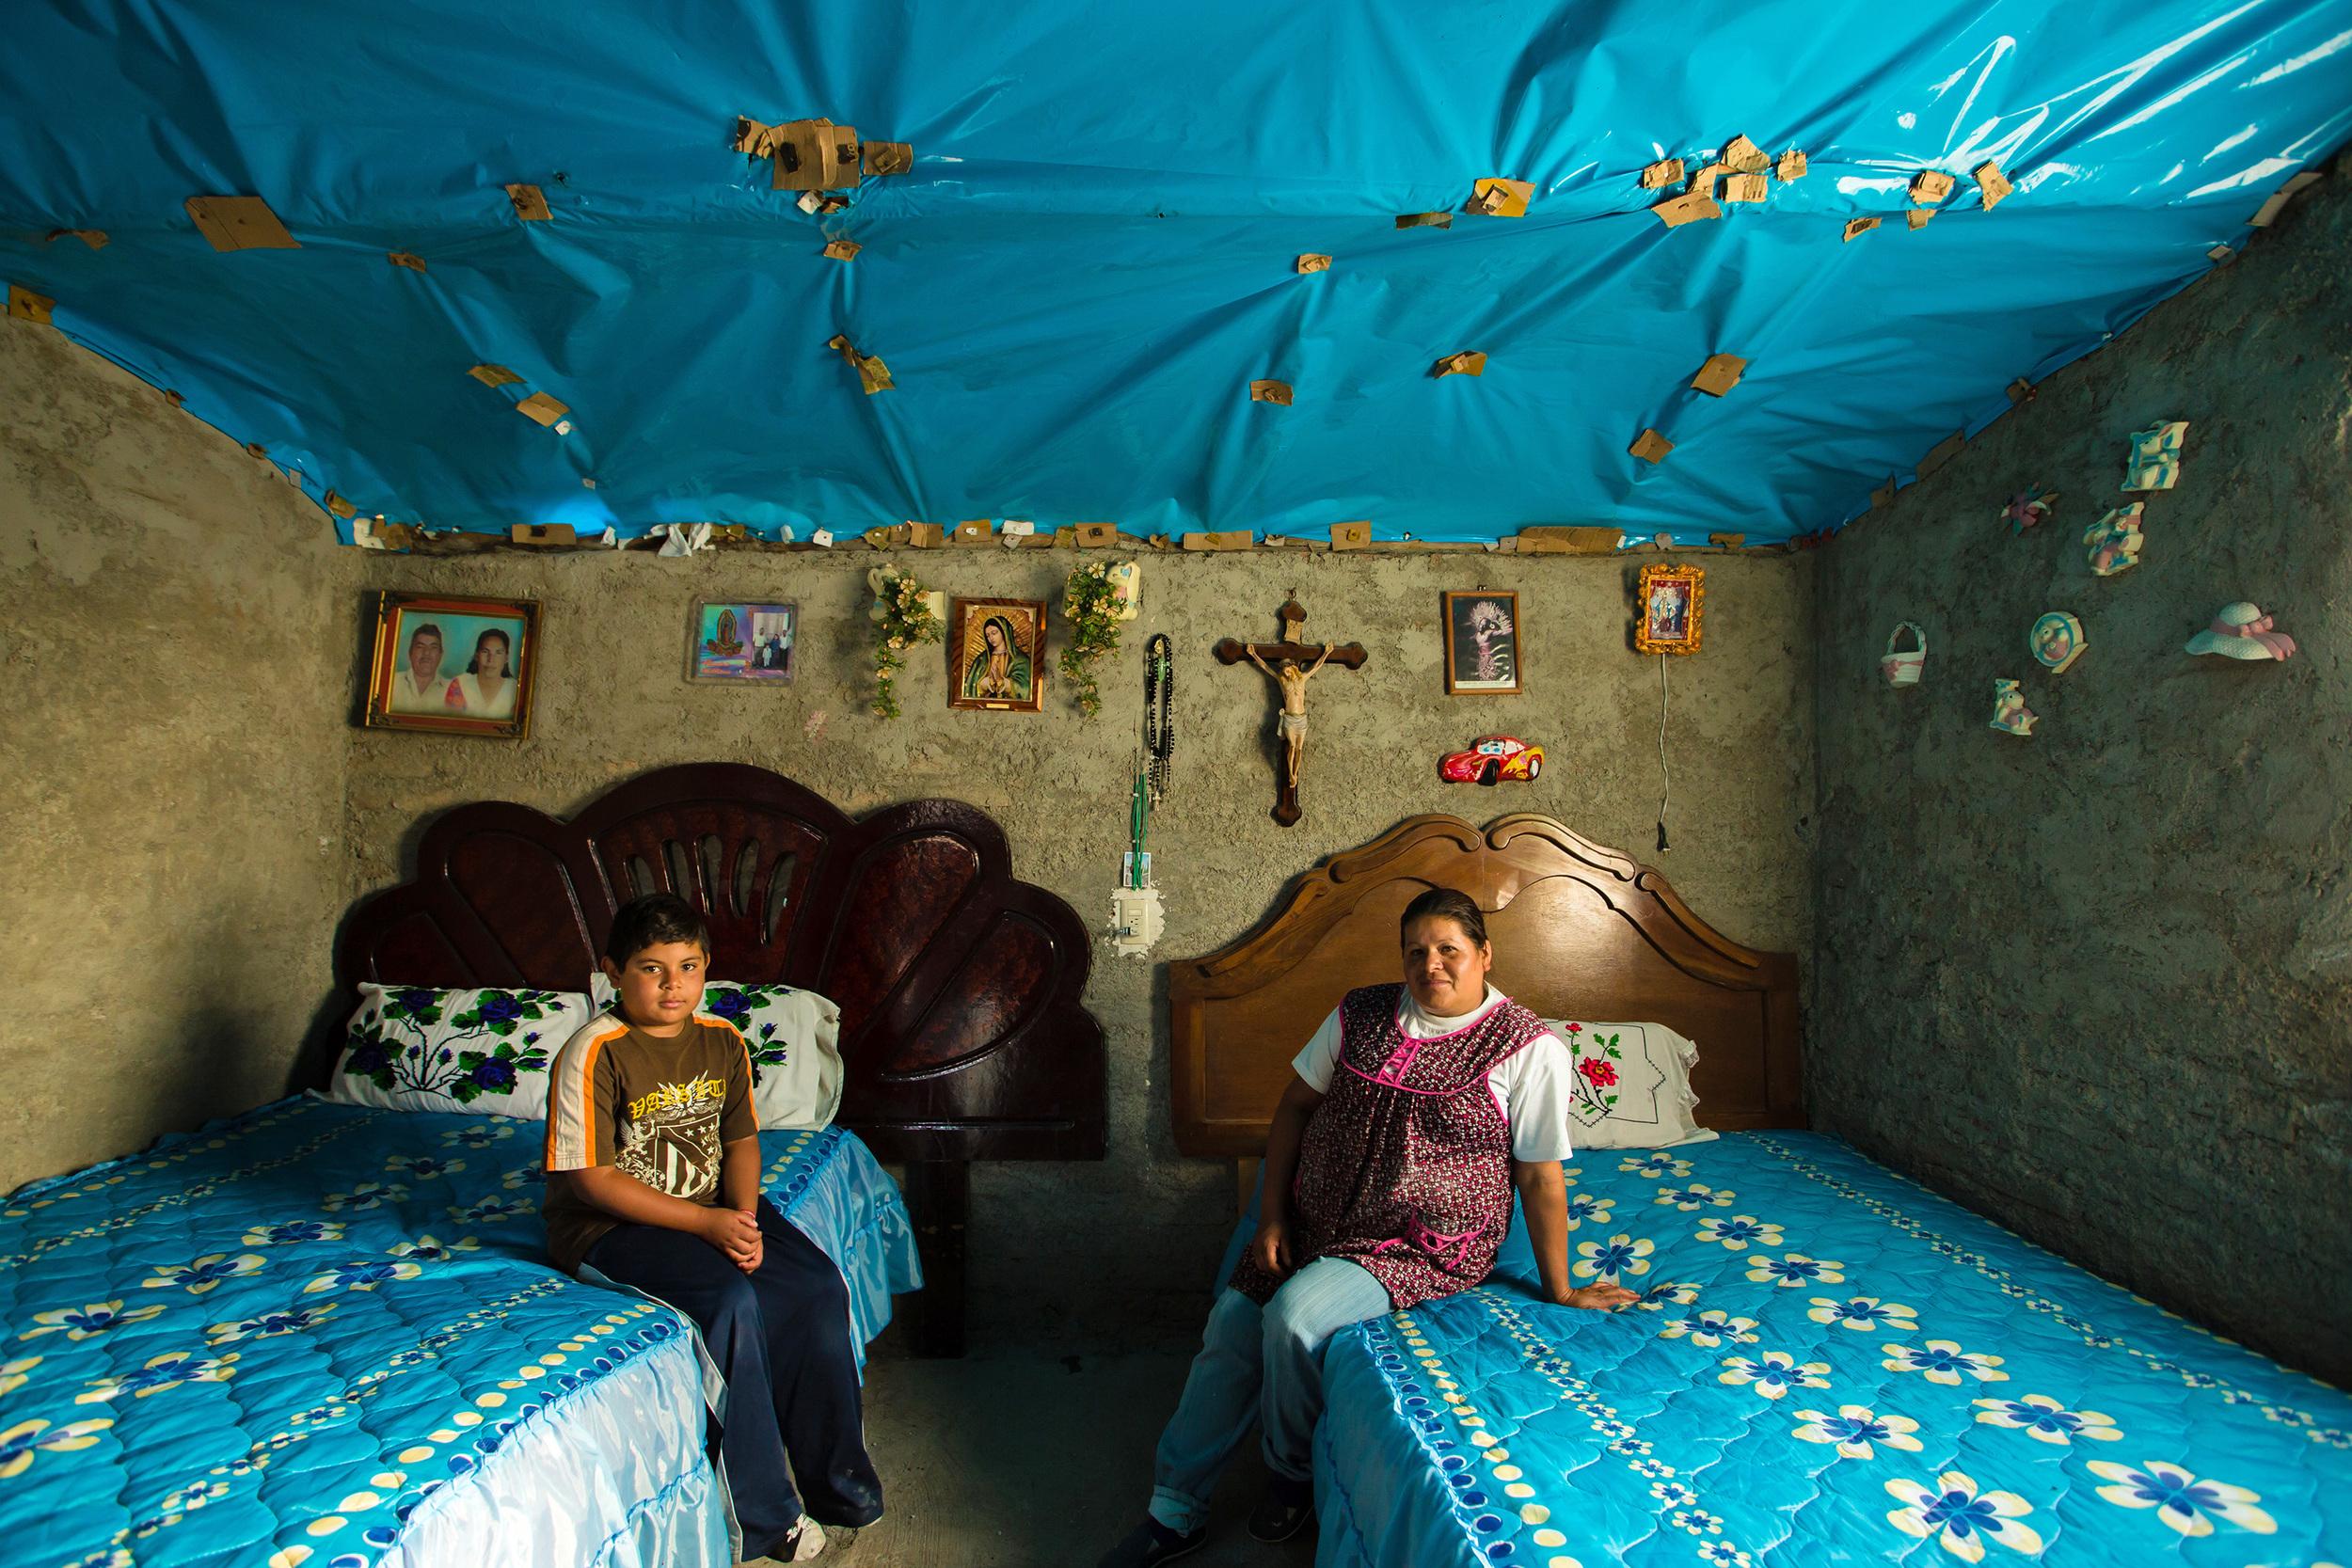 la casa azul_3000.jpg